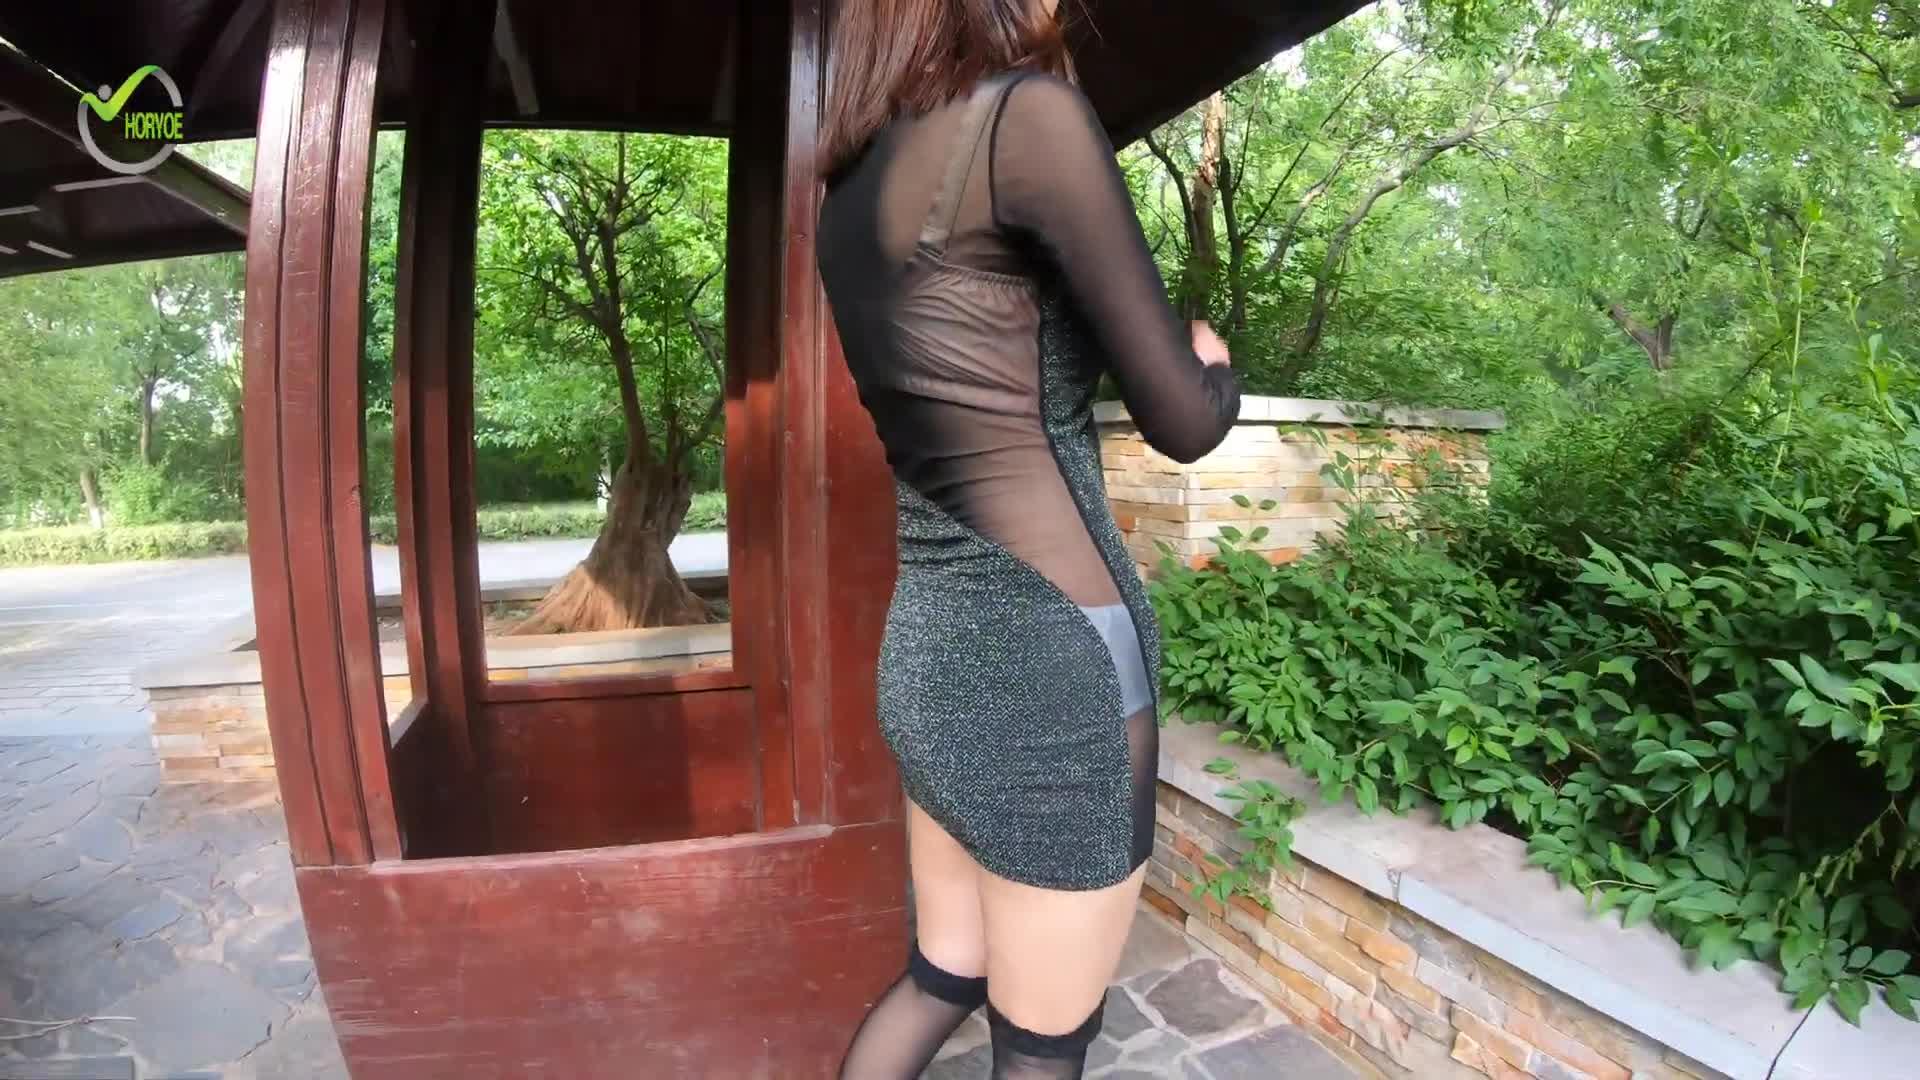 [4K] [中集]Beautiful Chinese Girls & Short skirt 街拍 透视 短裙女生 YC MJH006 Mejores Videos  Viable Fashi